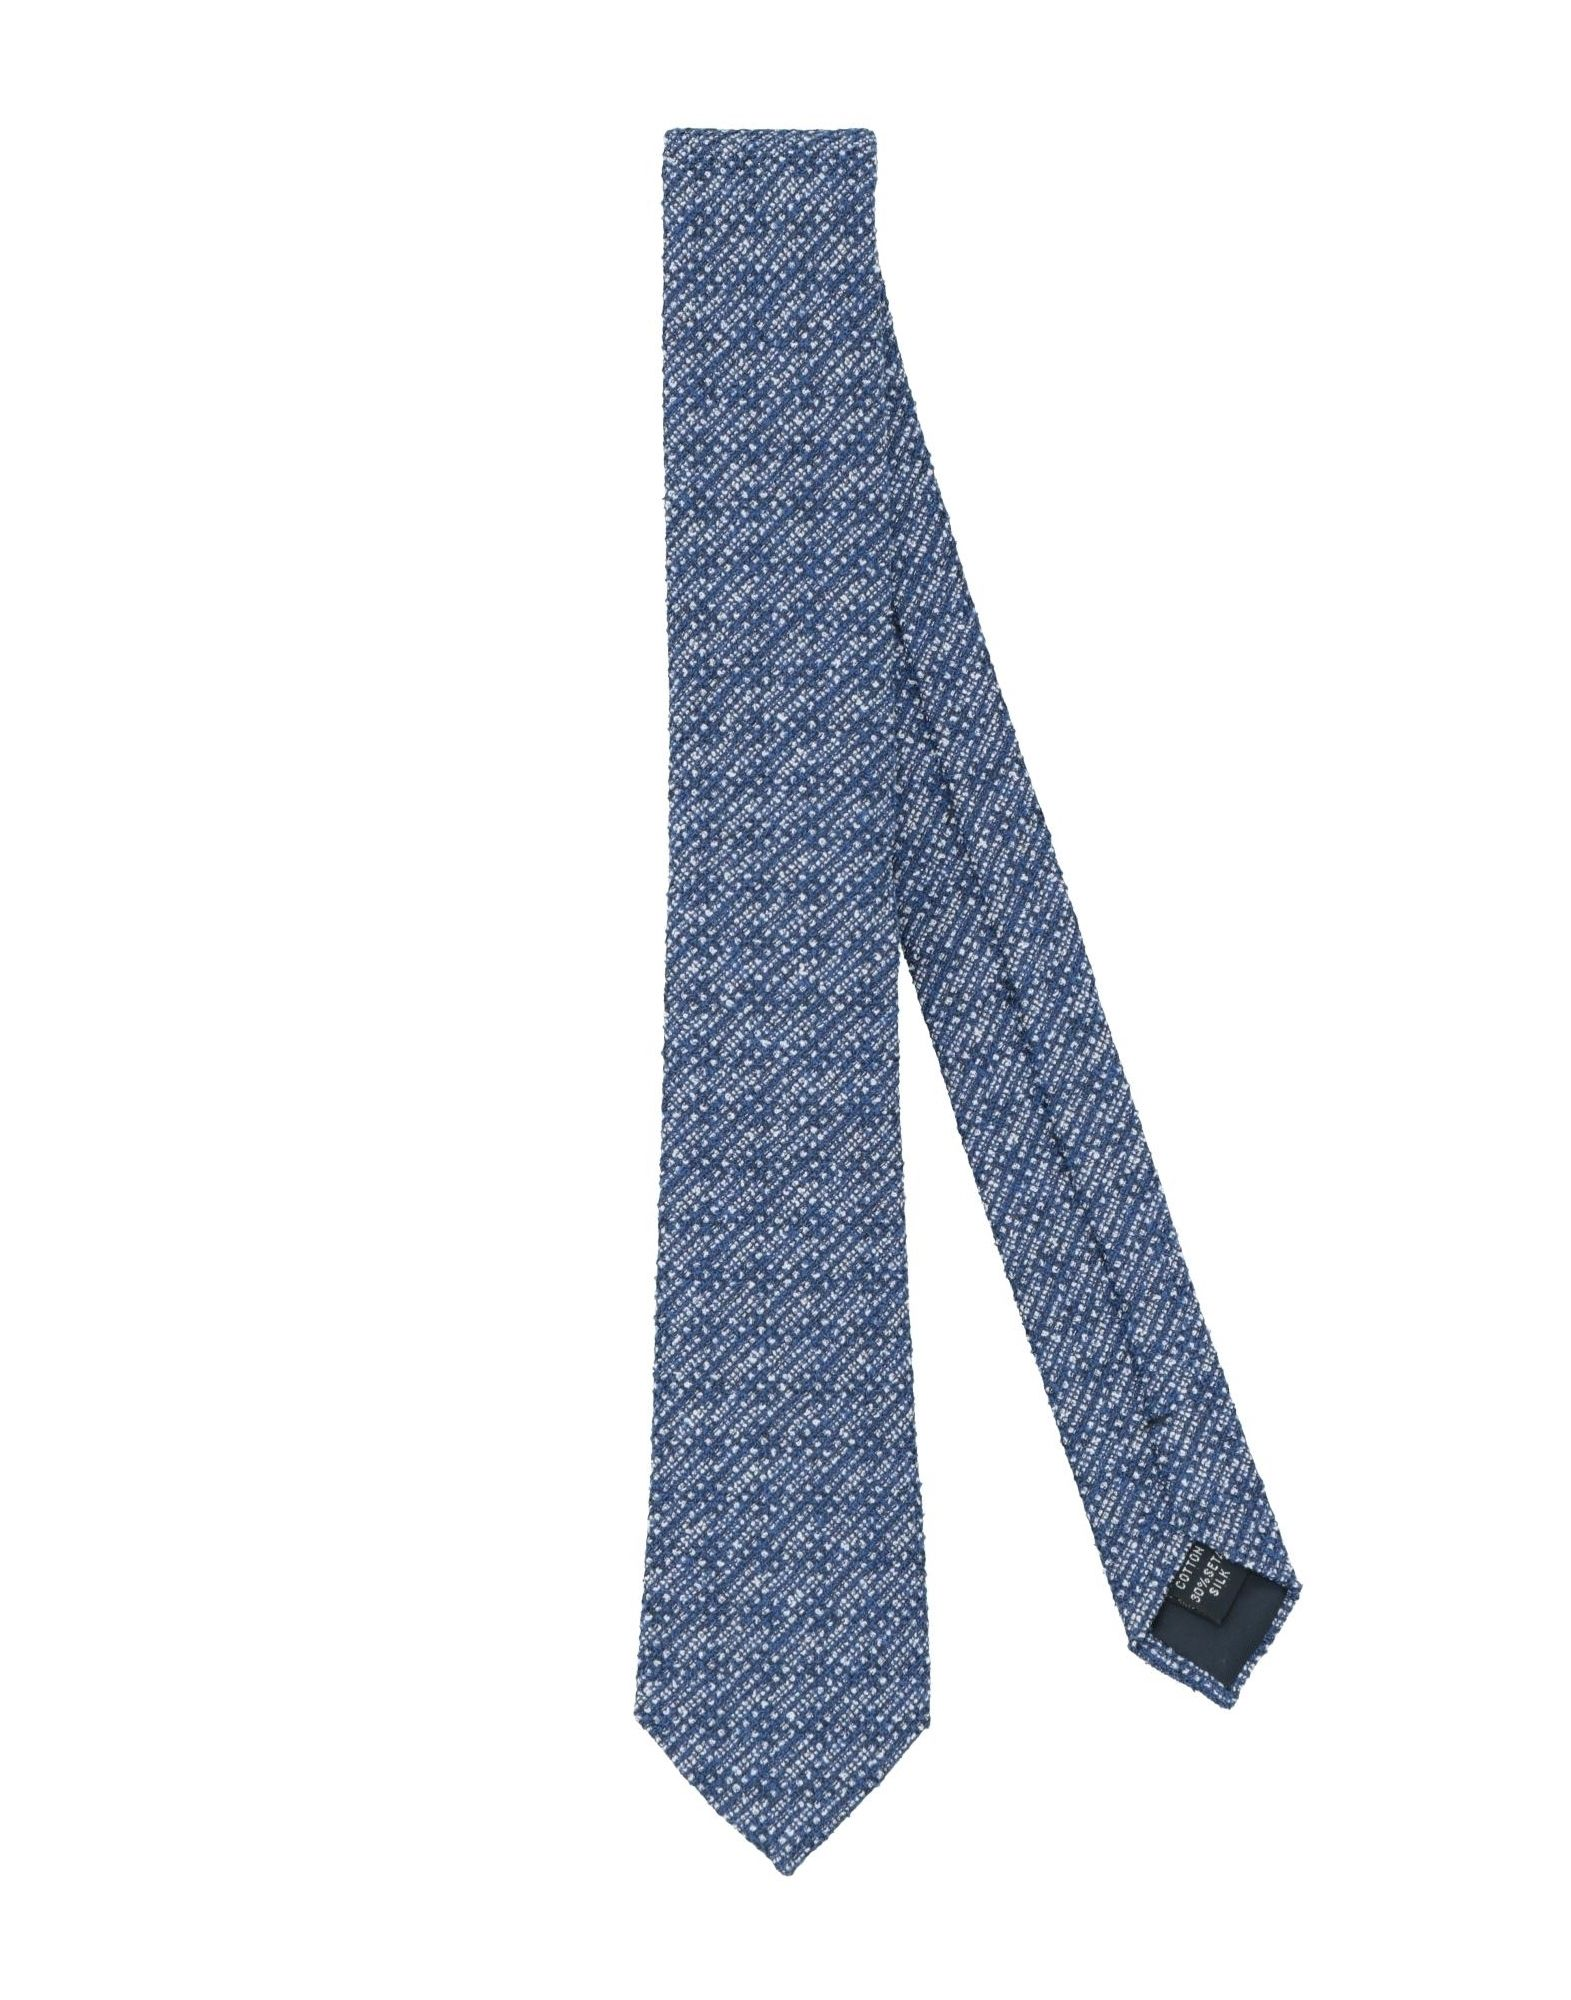 MANUEL RITZ Галстук manuel ritz галстук